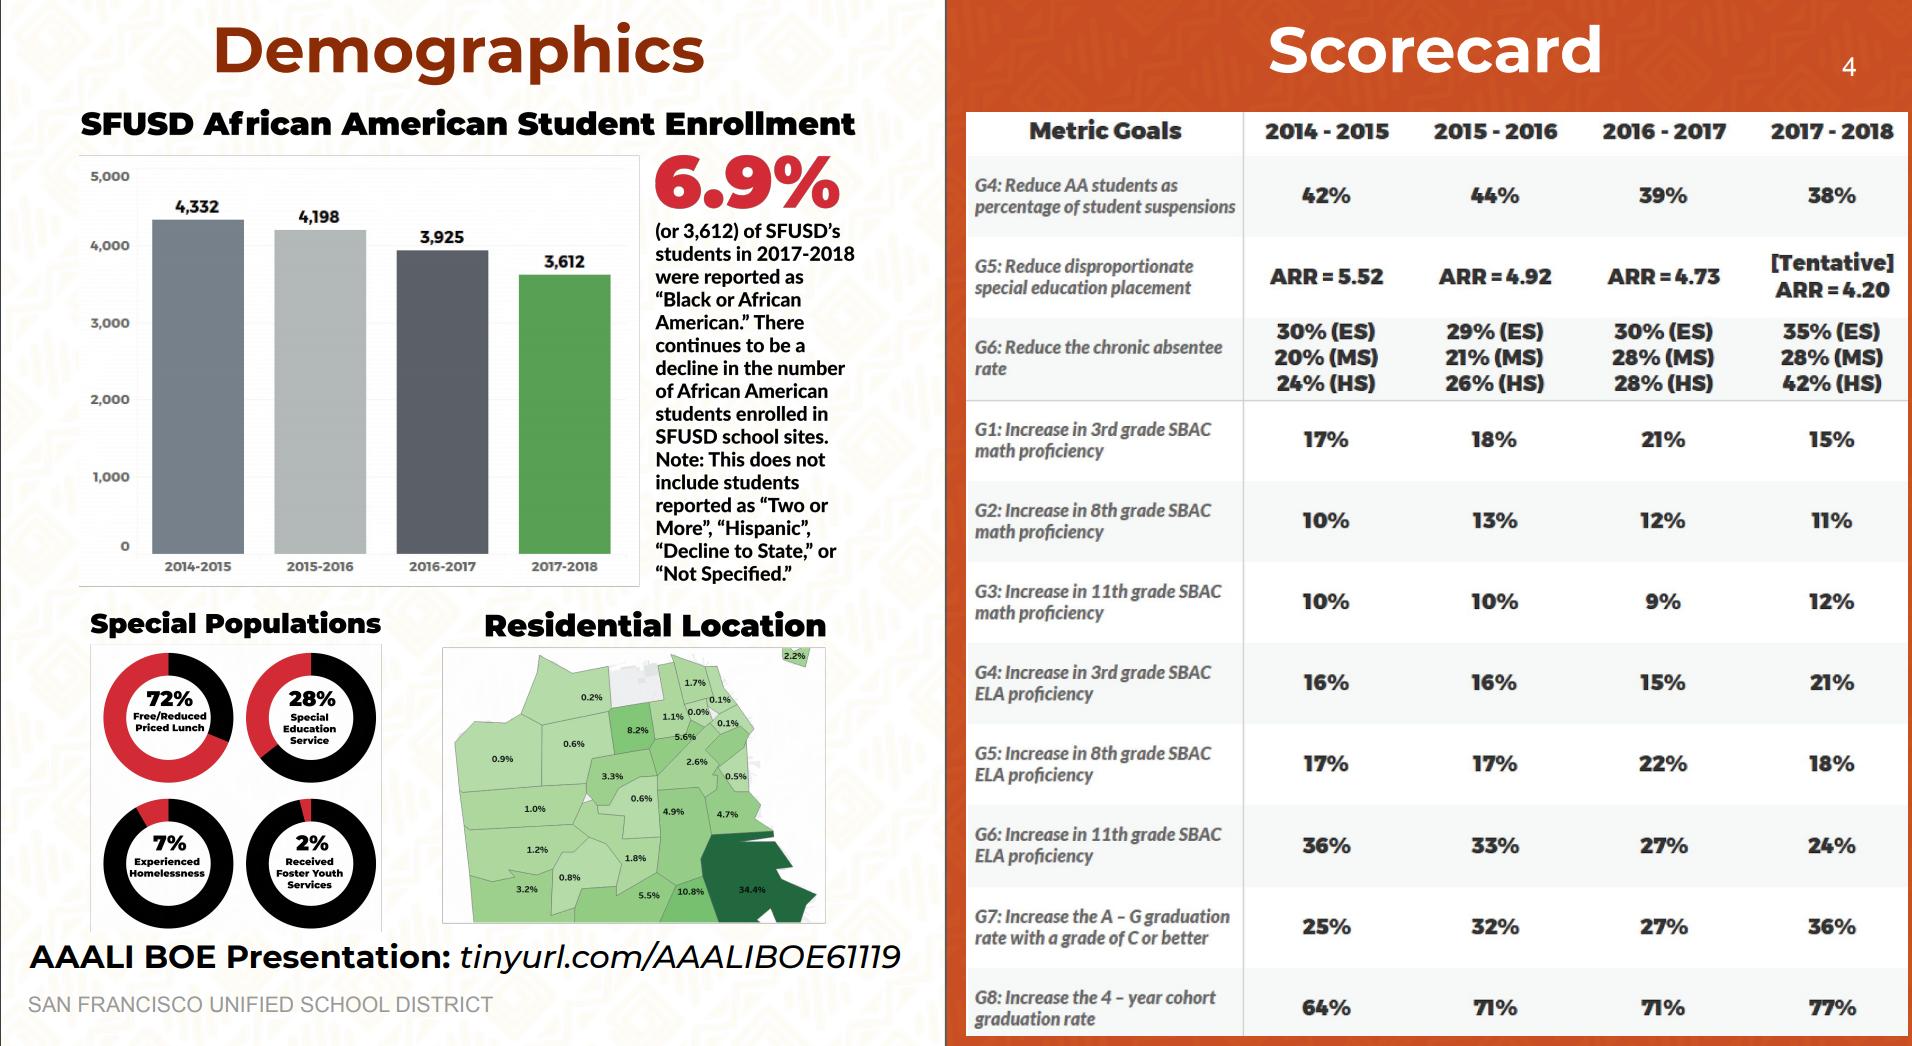 Source: SFUSD  https://go.boarddocs.com/ca/sfusd/Board.nsf/files/BCZNFZ5EBDEF/$file/6.11.19%20Board%20of%20Education%20AAALI%20Presentation.pdf